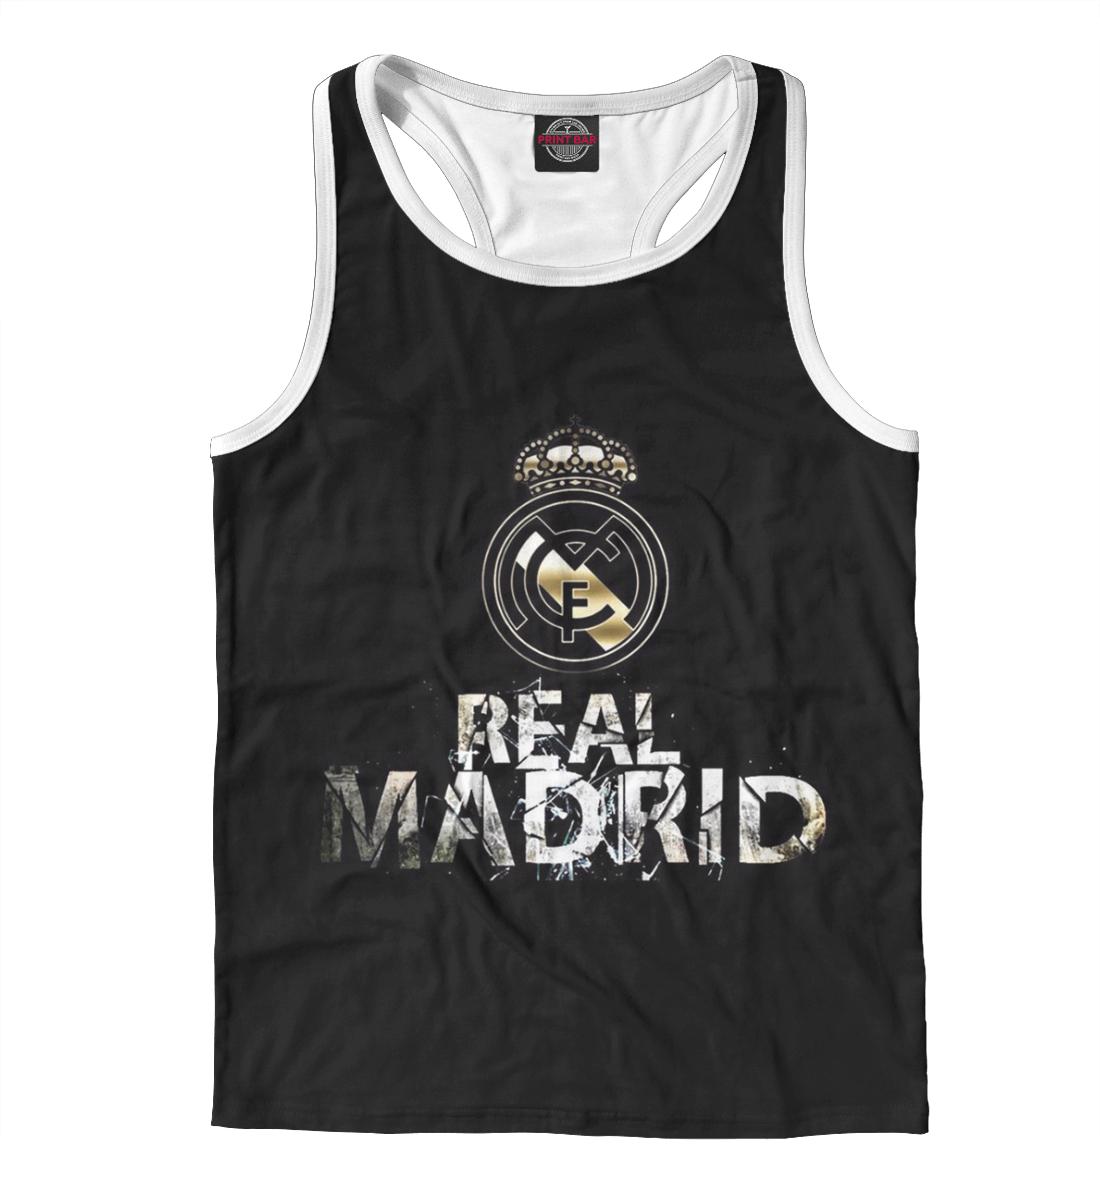 Купить FC Real Madrid, Printbar, Майки борцовки, REA-290050-mayb-2